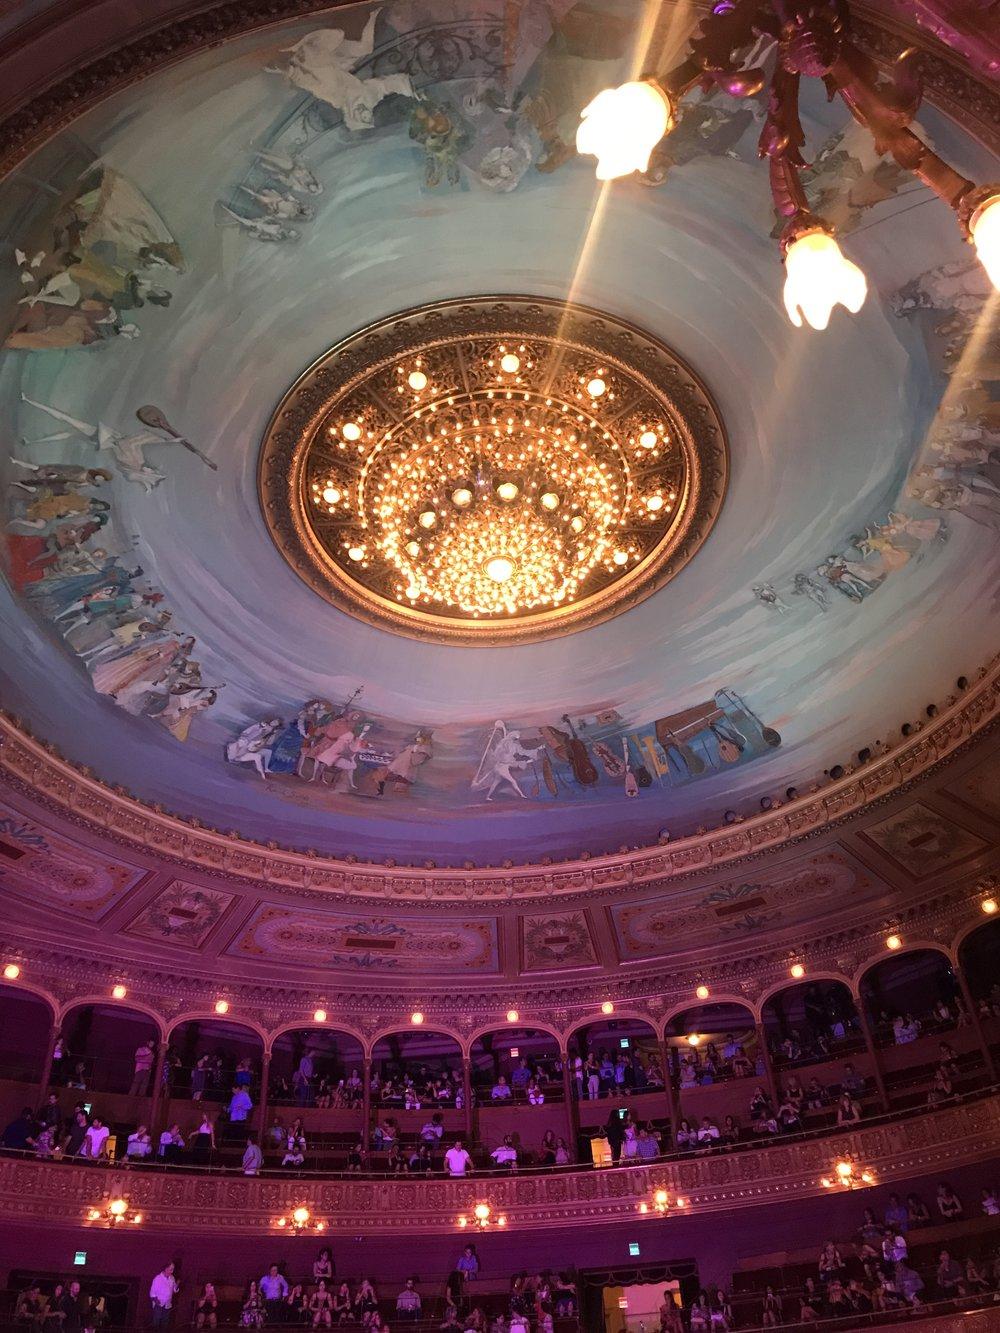 Teatro Colon arana.jpg